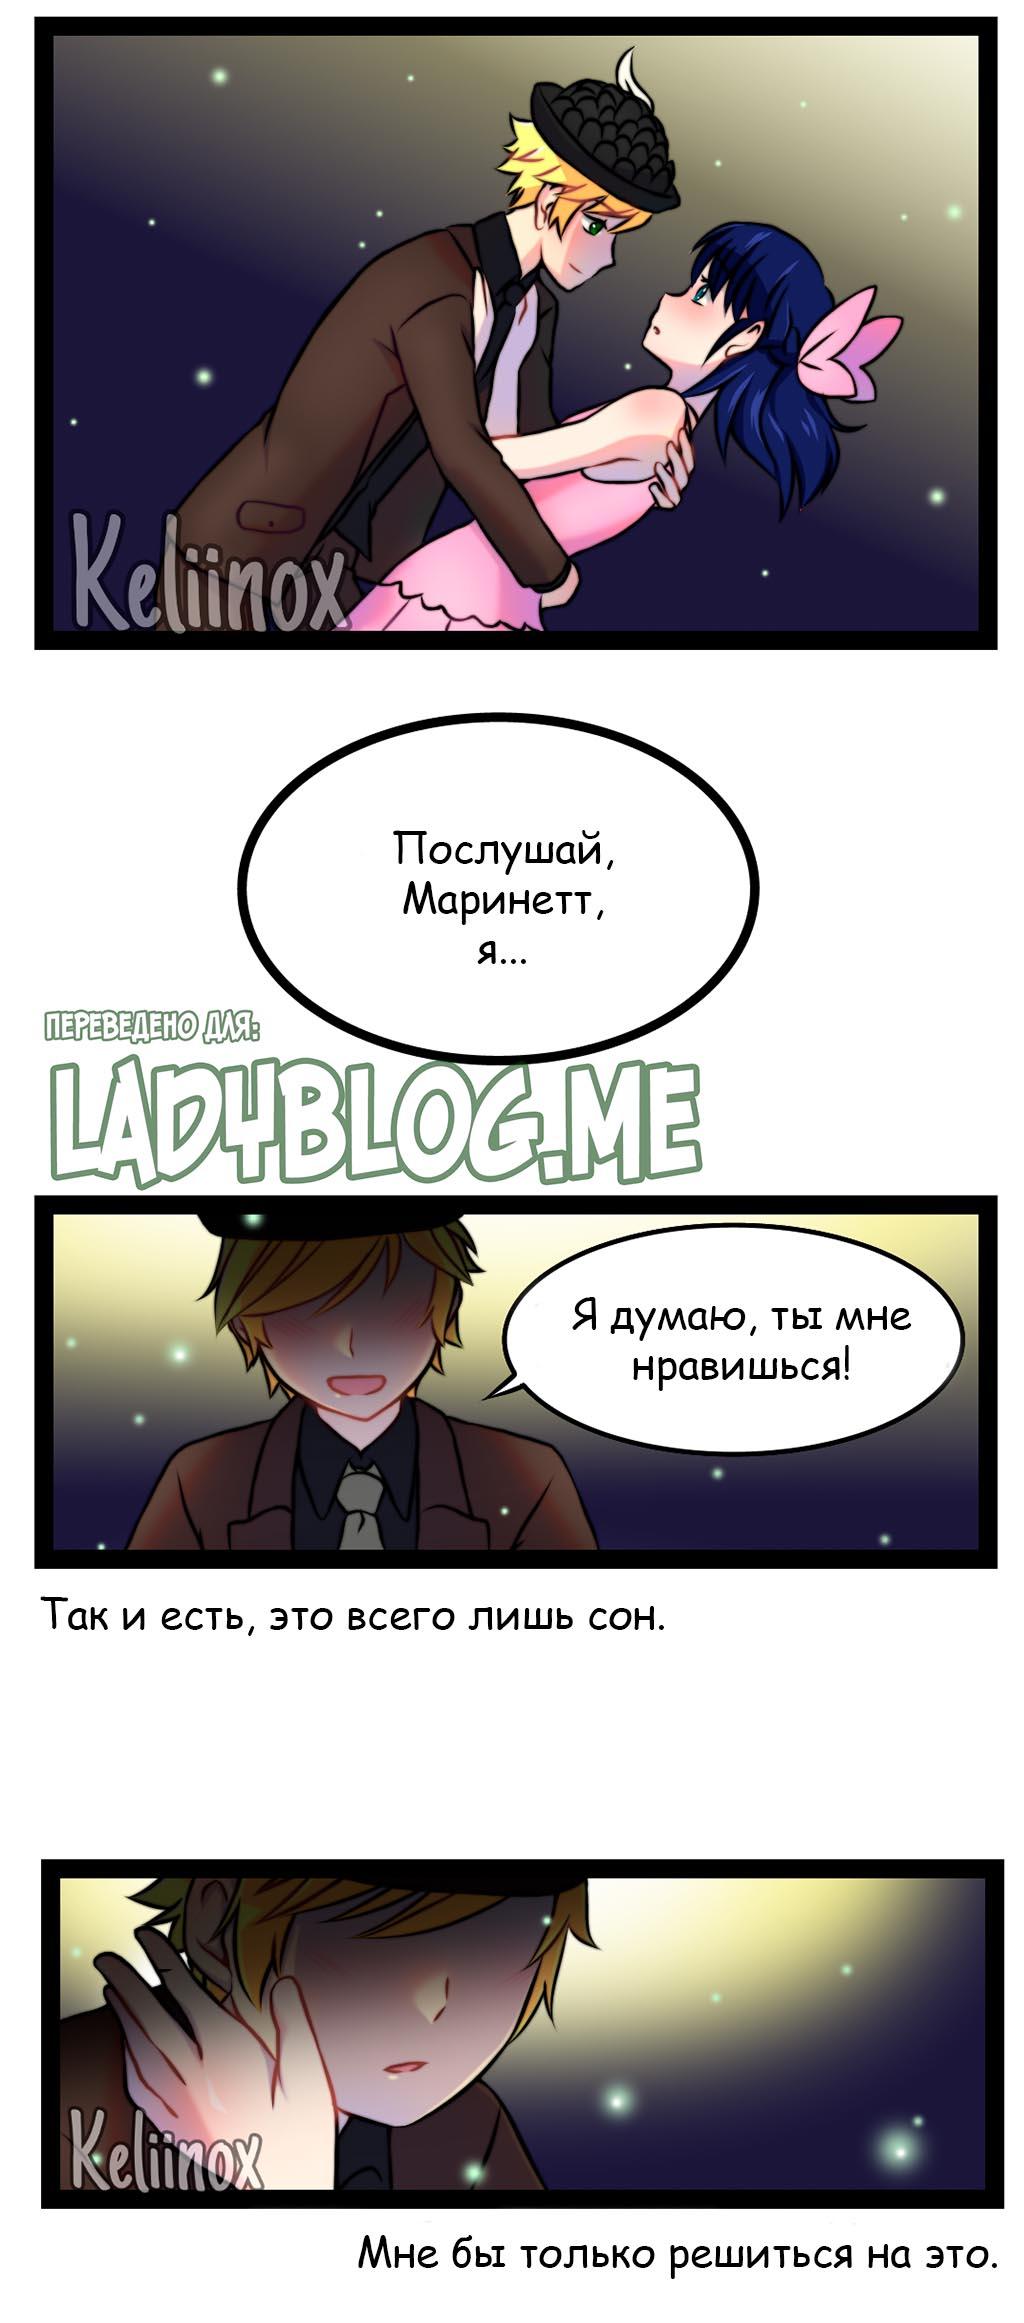 Комикс Леди Баг и Супер-Кот Главный танец 18-2